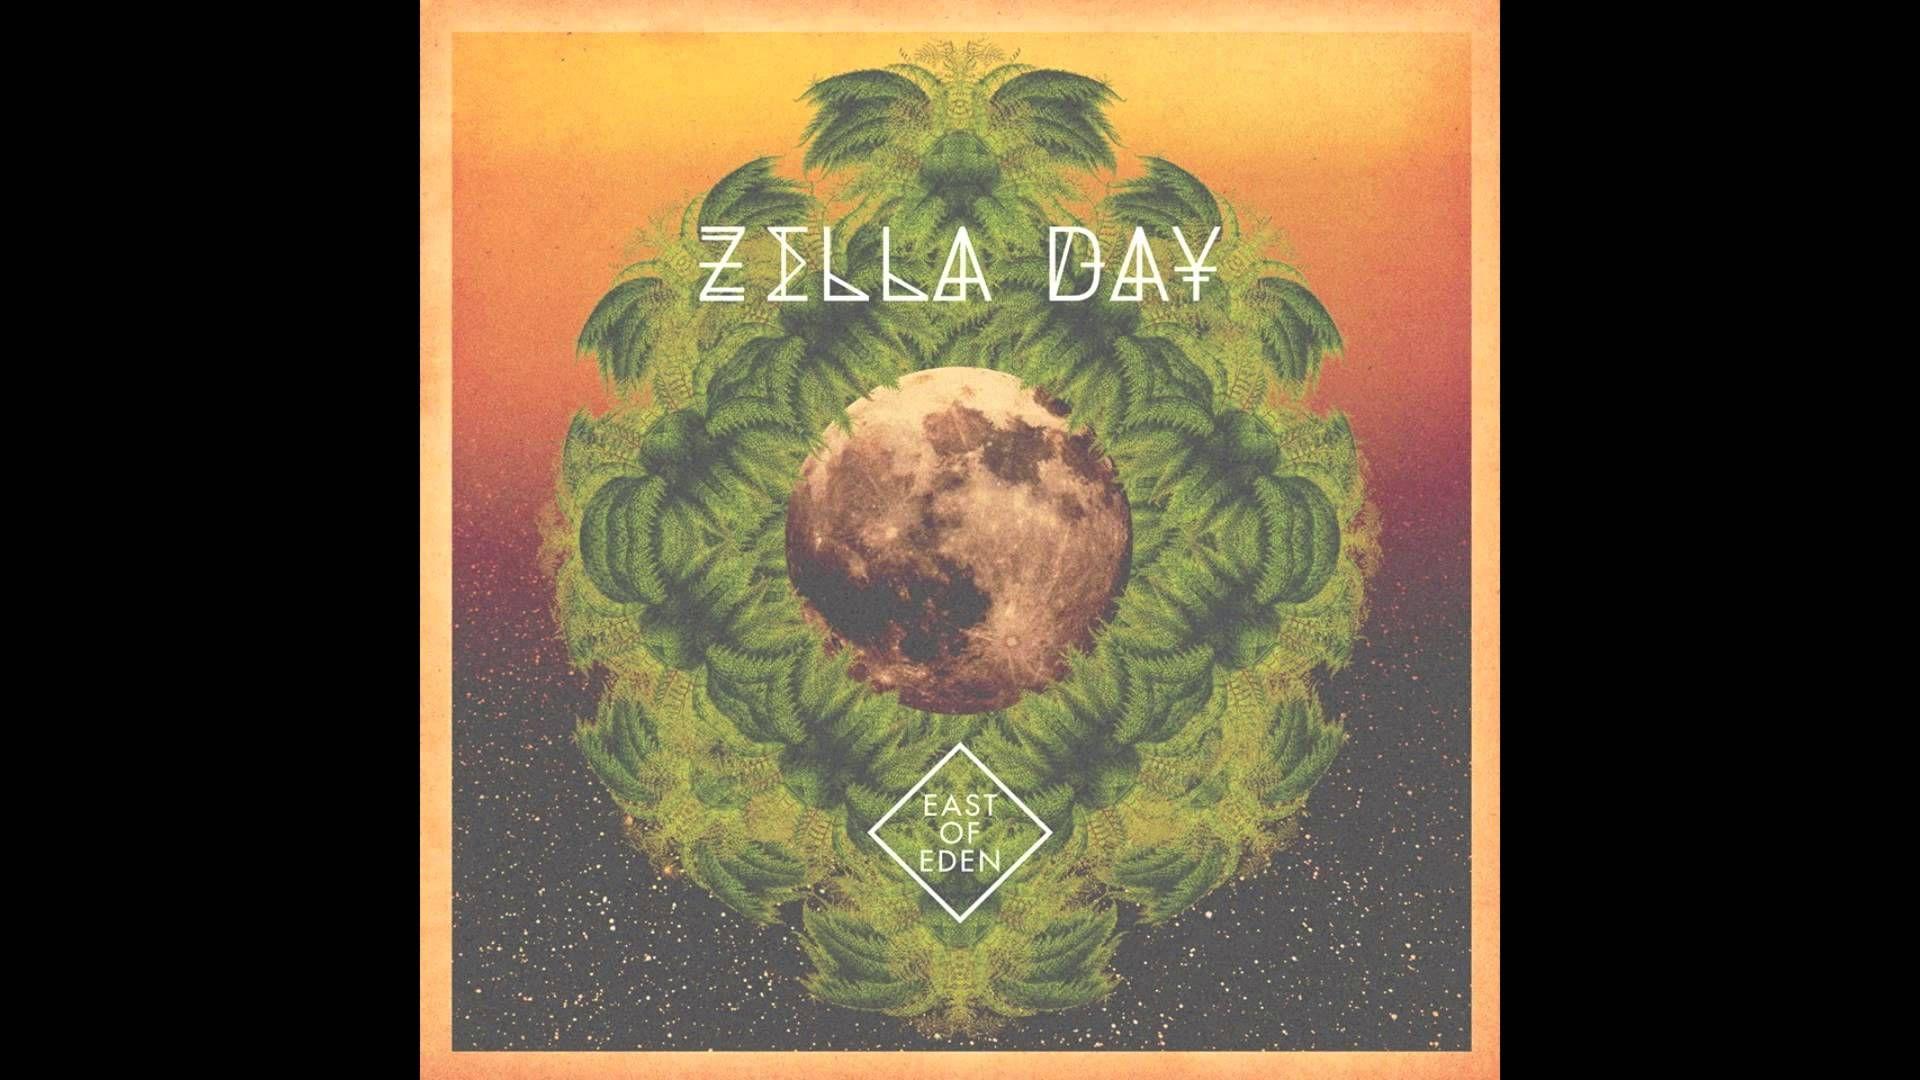 Zella Day East of Eden East of eden, Zella, Kinds of music